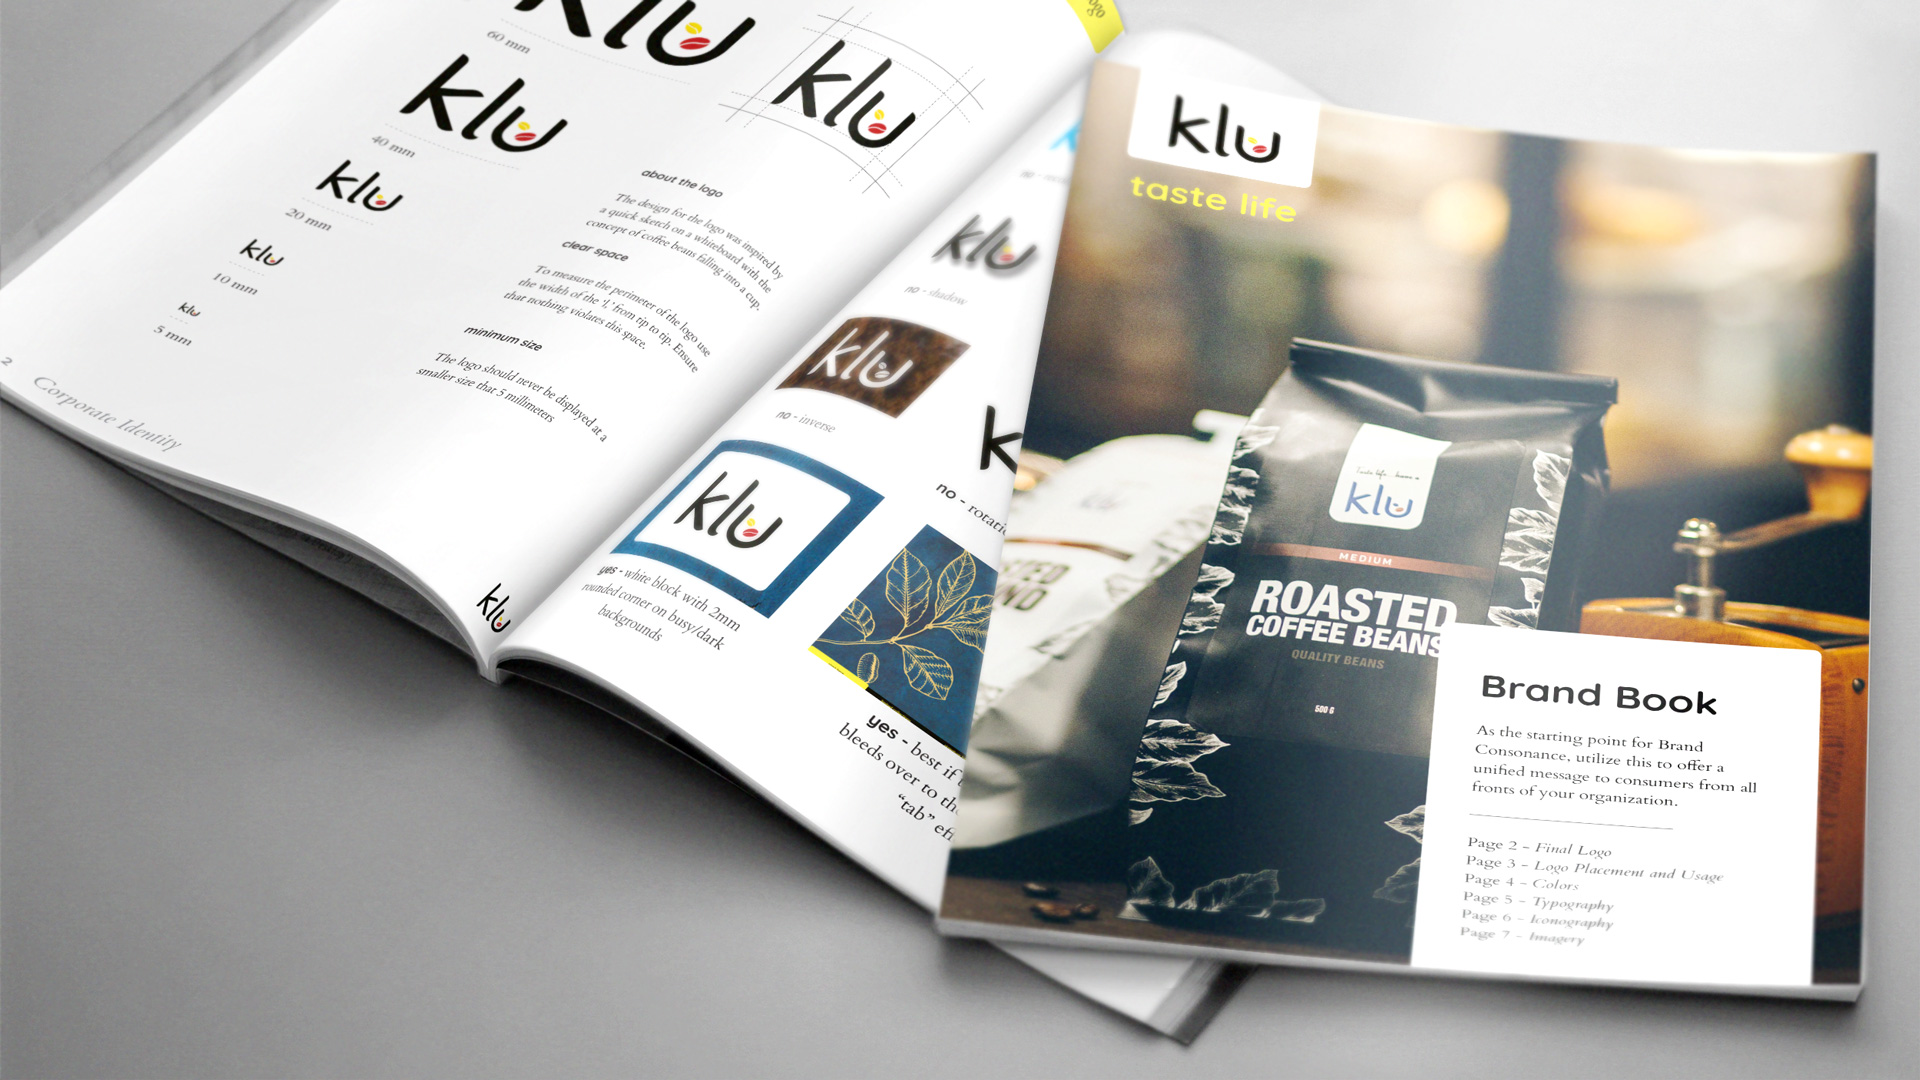 Klu Brand Book Paper Mockup